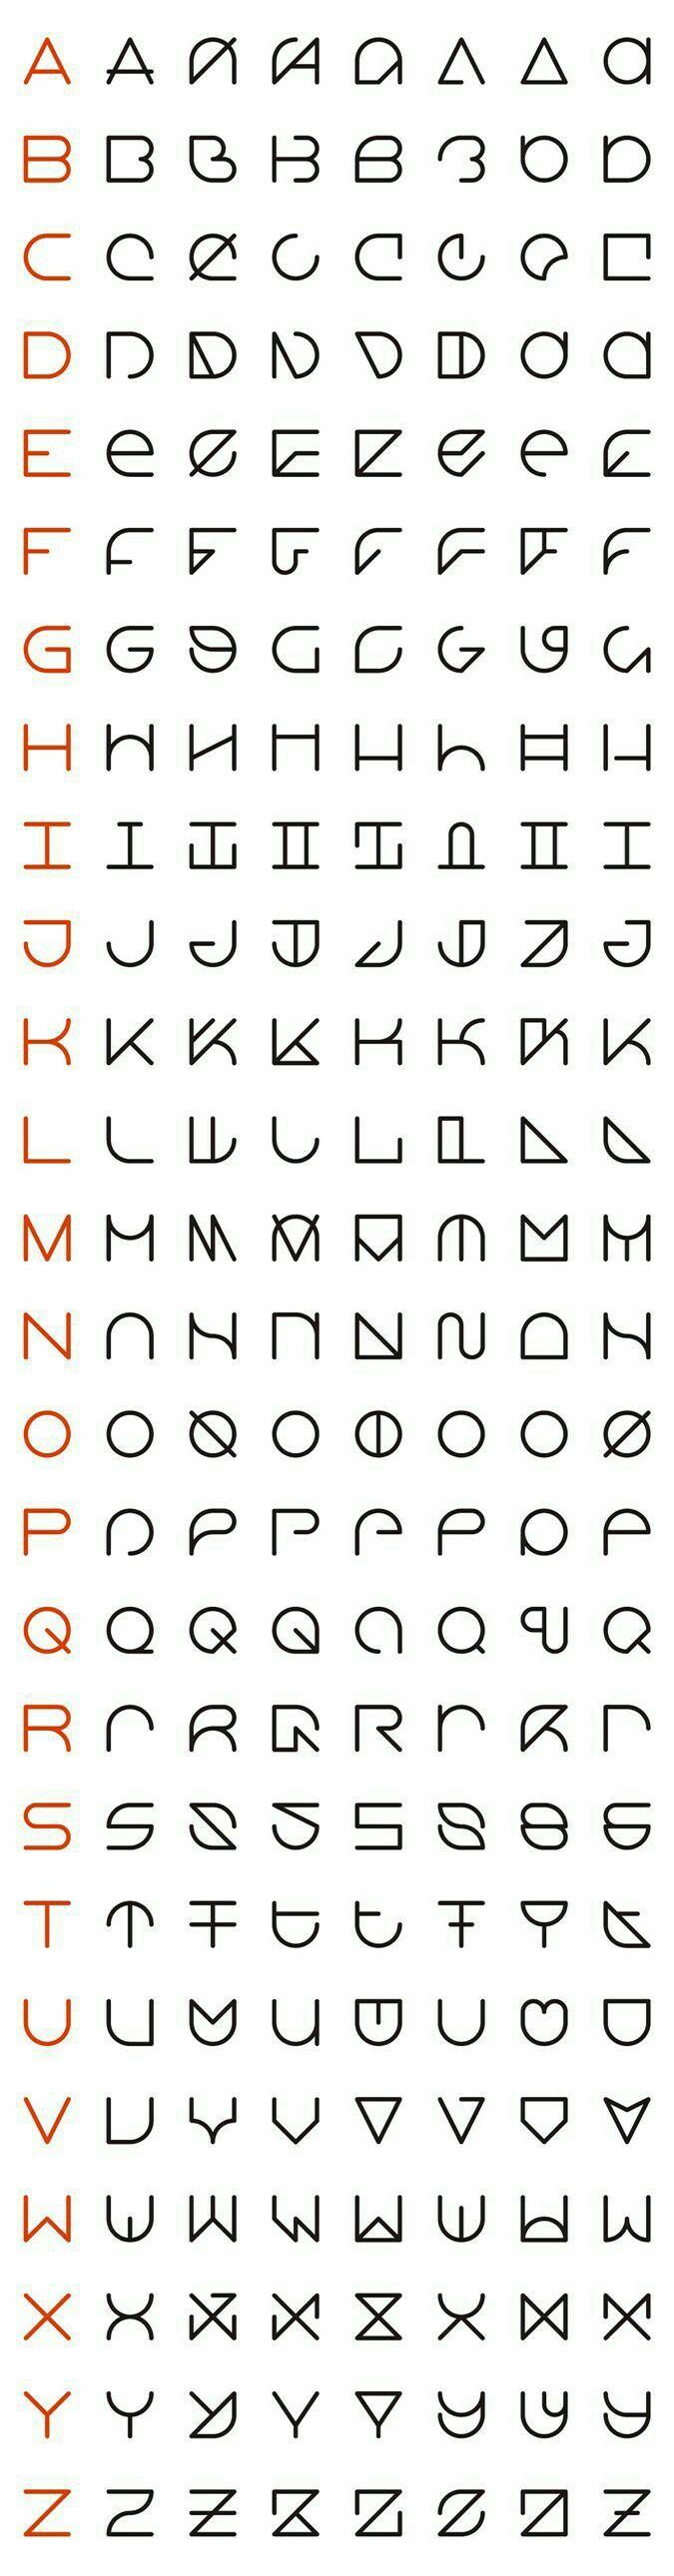 Pin by nurul jannah on typography pinterest minimalist fonts logos biocorpaavc Images